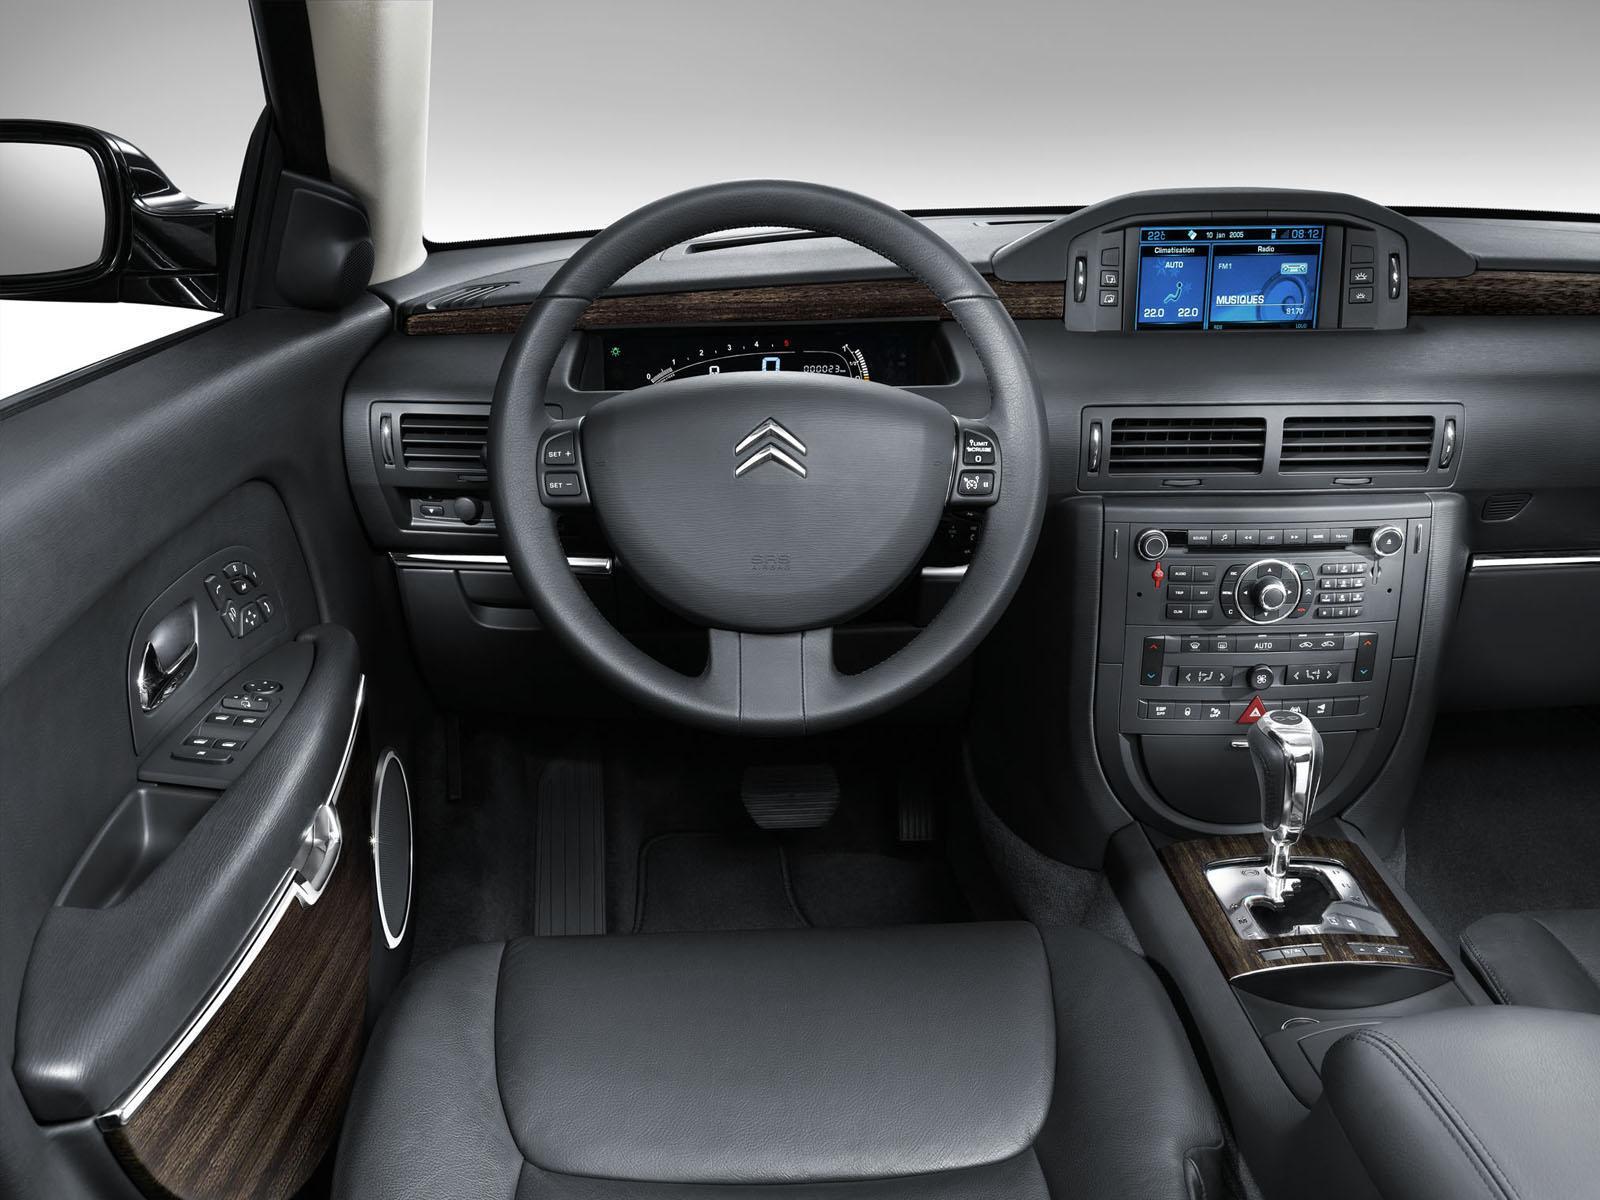 C6 V6 HDI exclusive 2005 poste de conduite